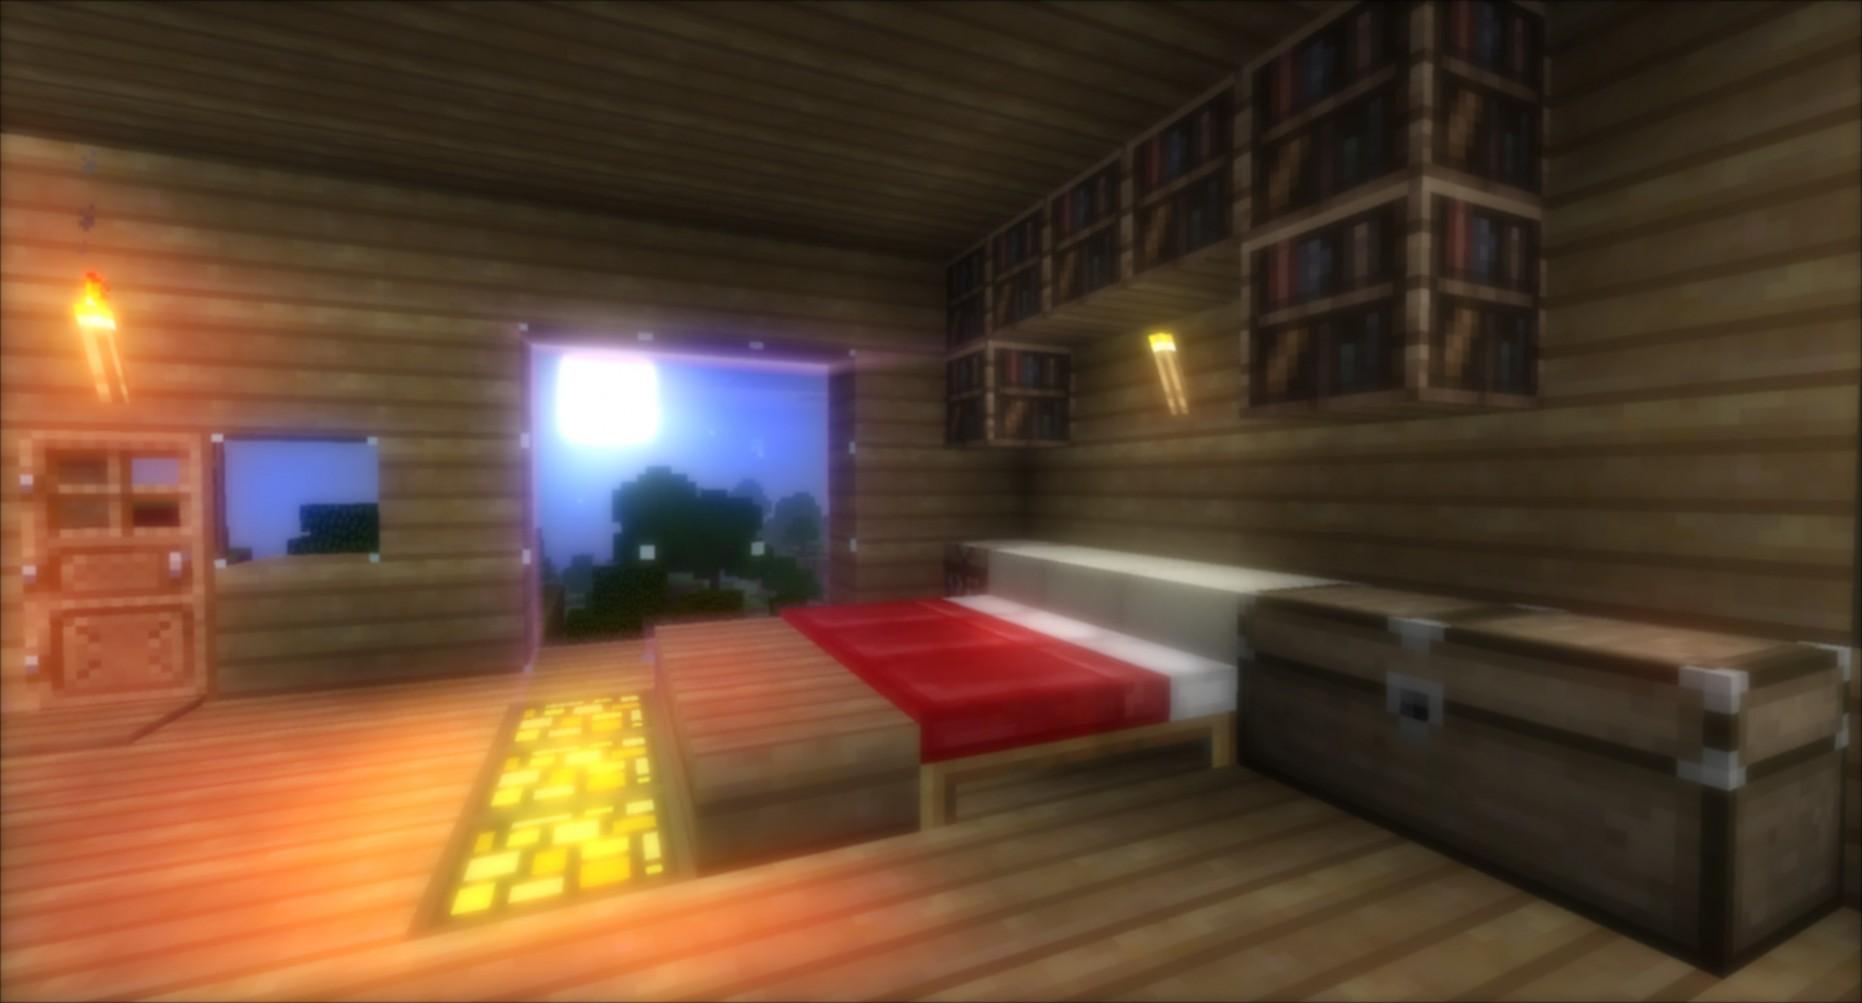 Minecraft Bedroom Decor Ideas Set Designs In Real Life Themed Wall  - Bedroom Ideas Minecraft